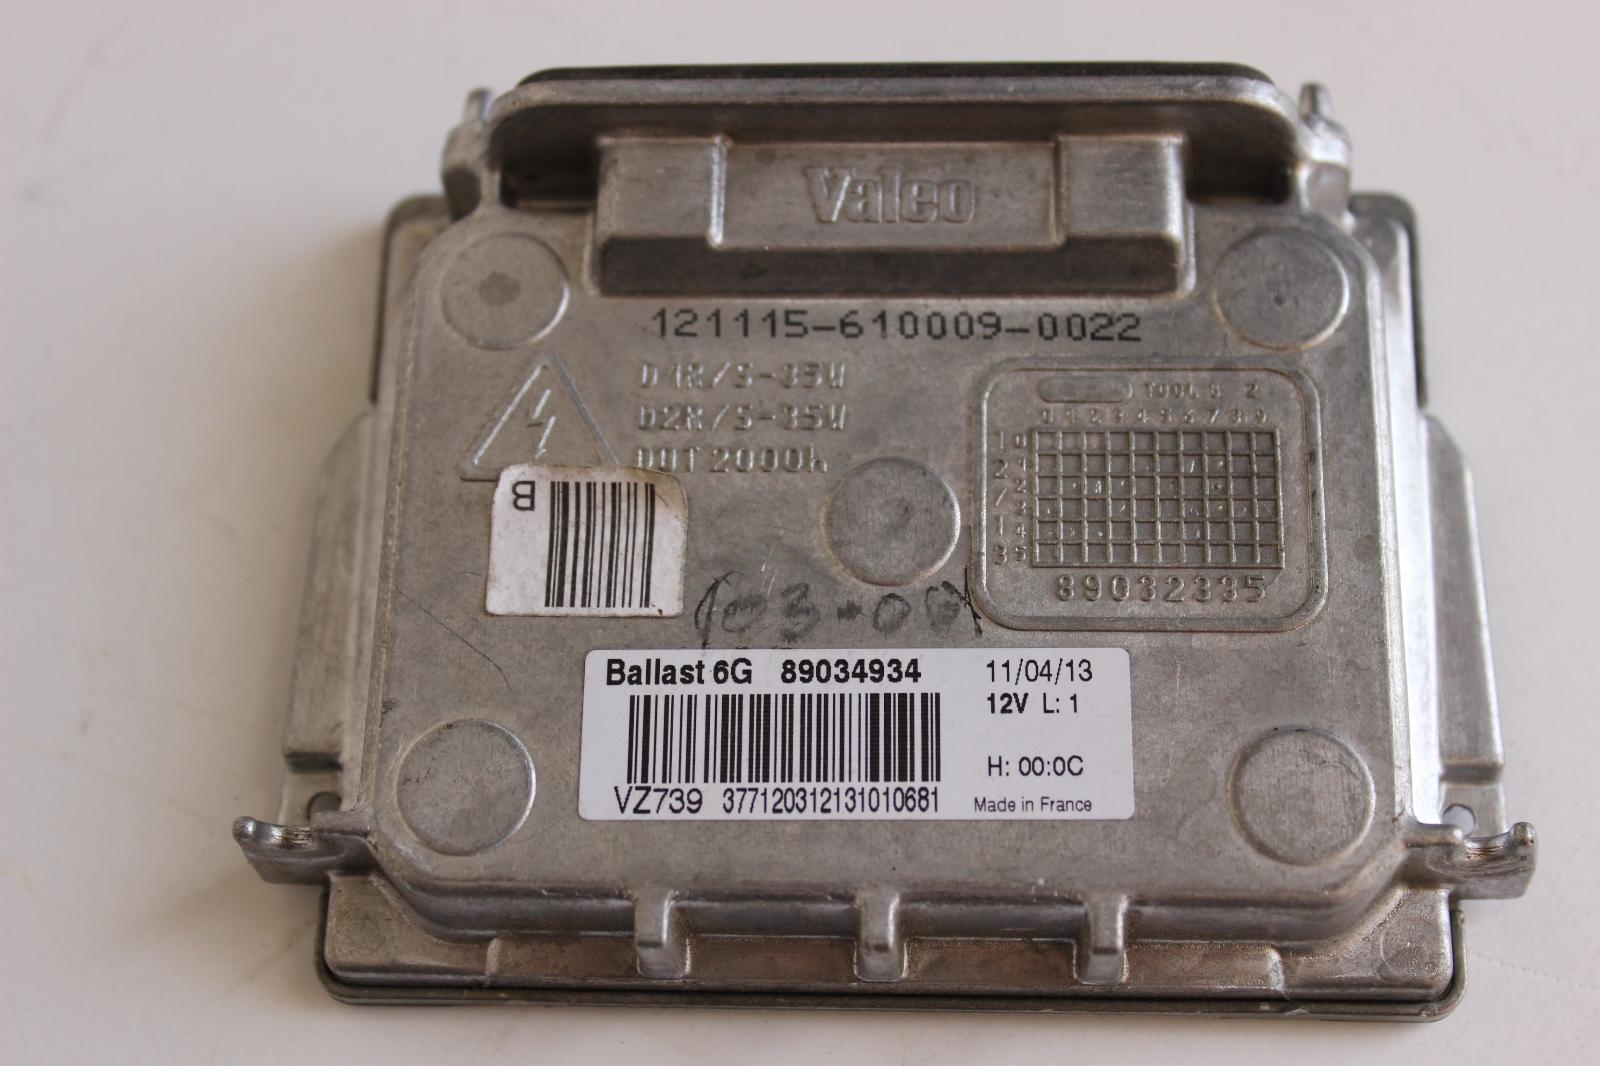 2007 2008 2009 2010 2011 2012 2013 2014 Volvo XC90 Xenon HID Headlight  Ballast Igniter